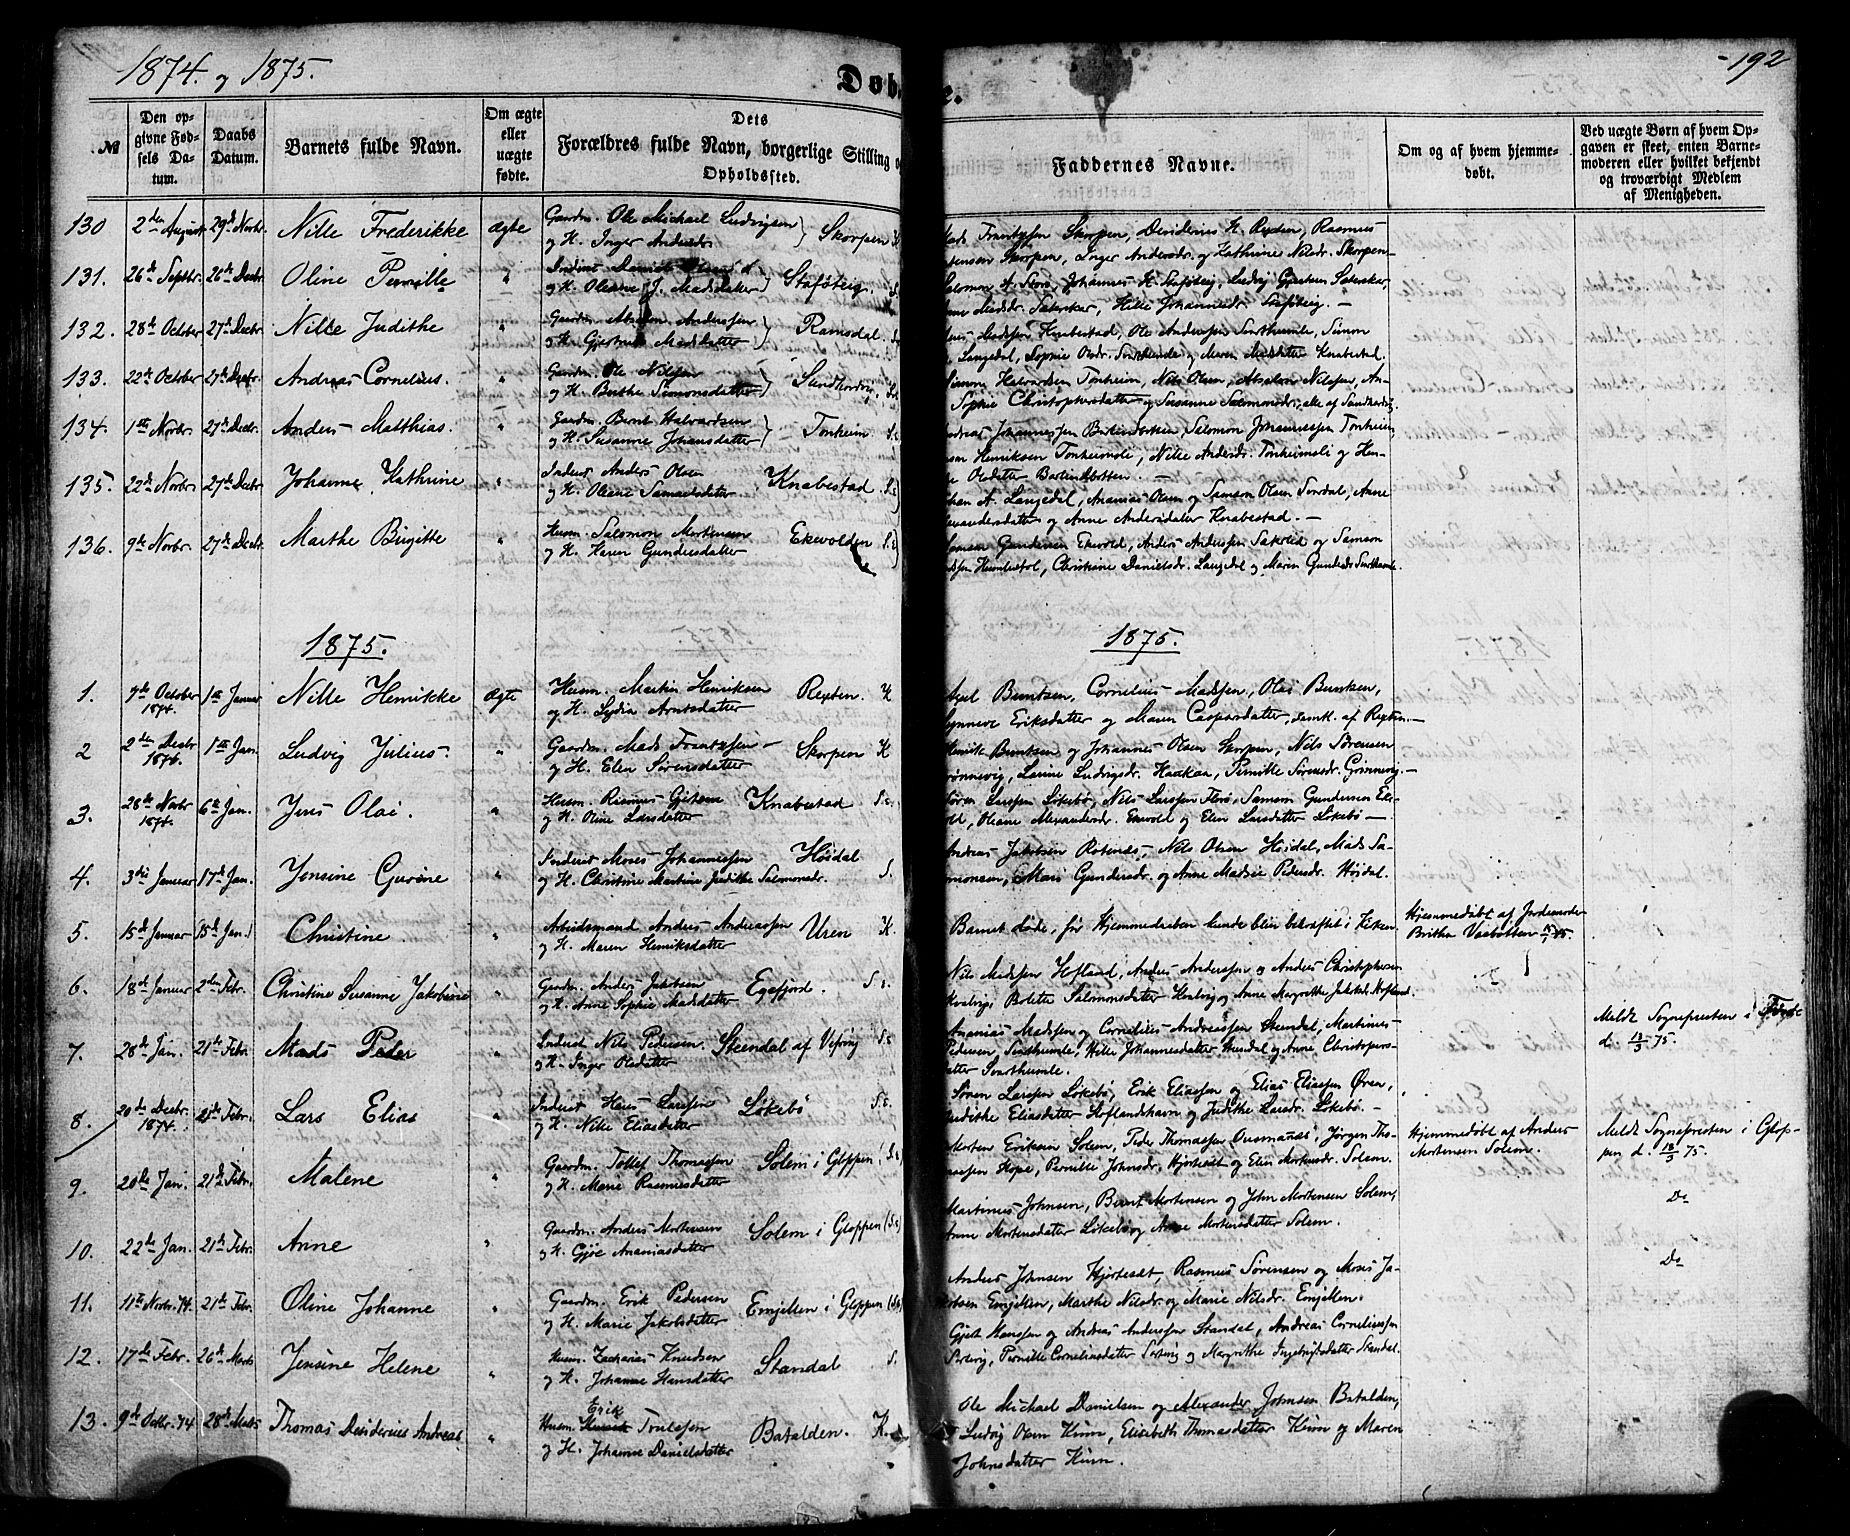 SAB, Kinn sokneprestembete, H/Haa/Haaa/L0006: Parish register (official) no. A 6, 1857-1885, p. 192